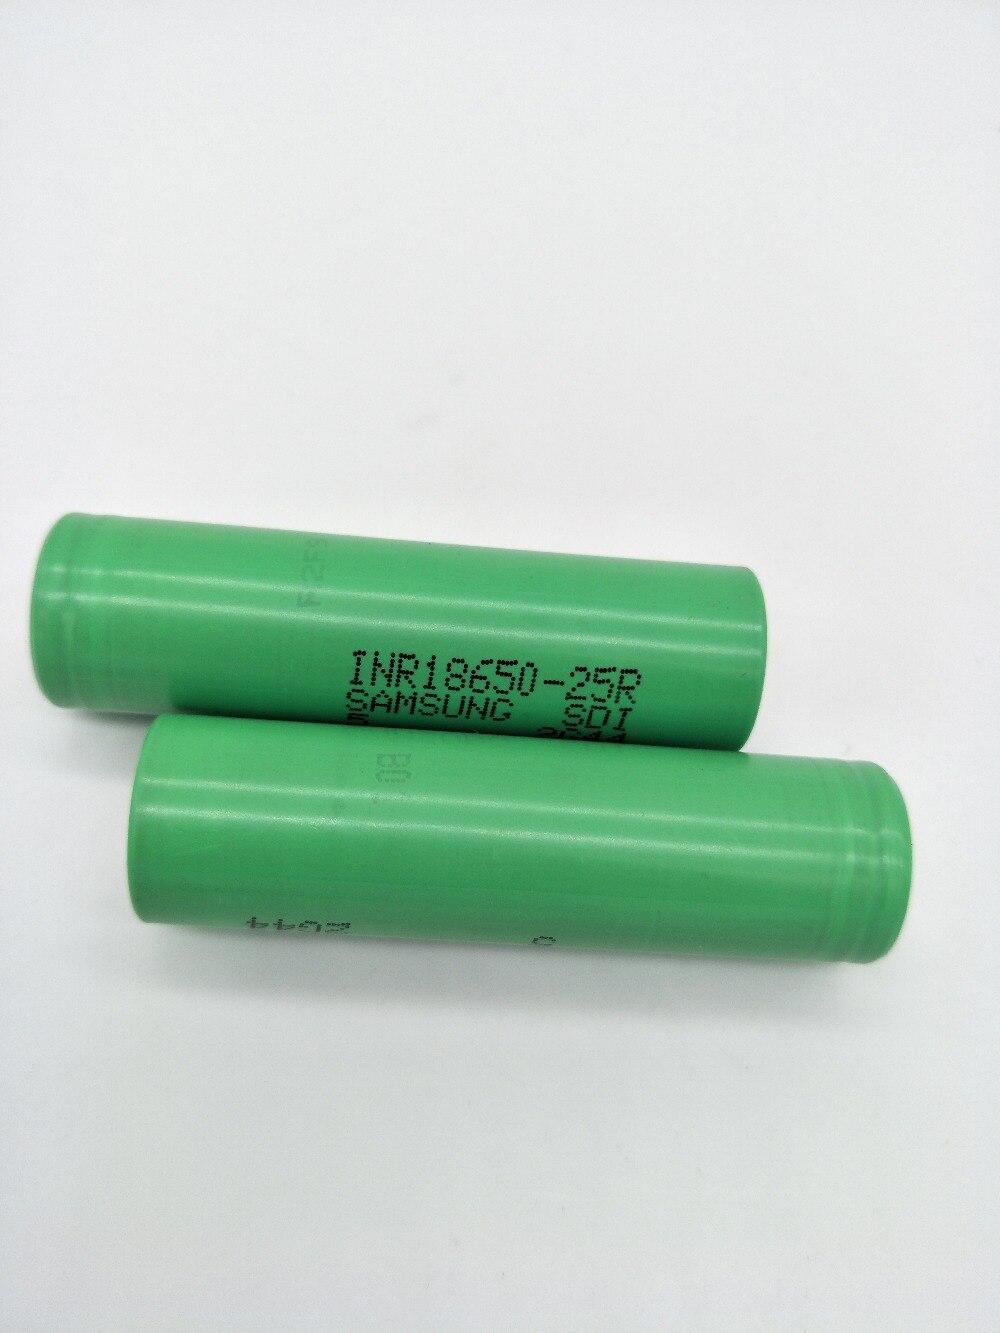 Baterias Recarregáveis 6 pcs liitokala para samsung Capacidade Nominal : 2500mah